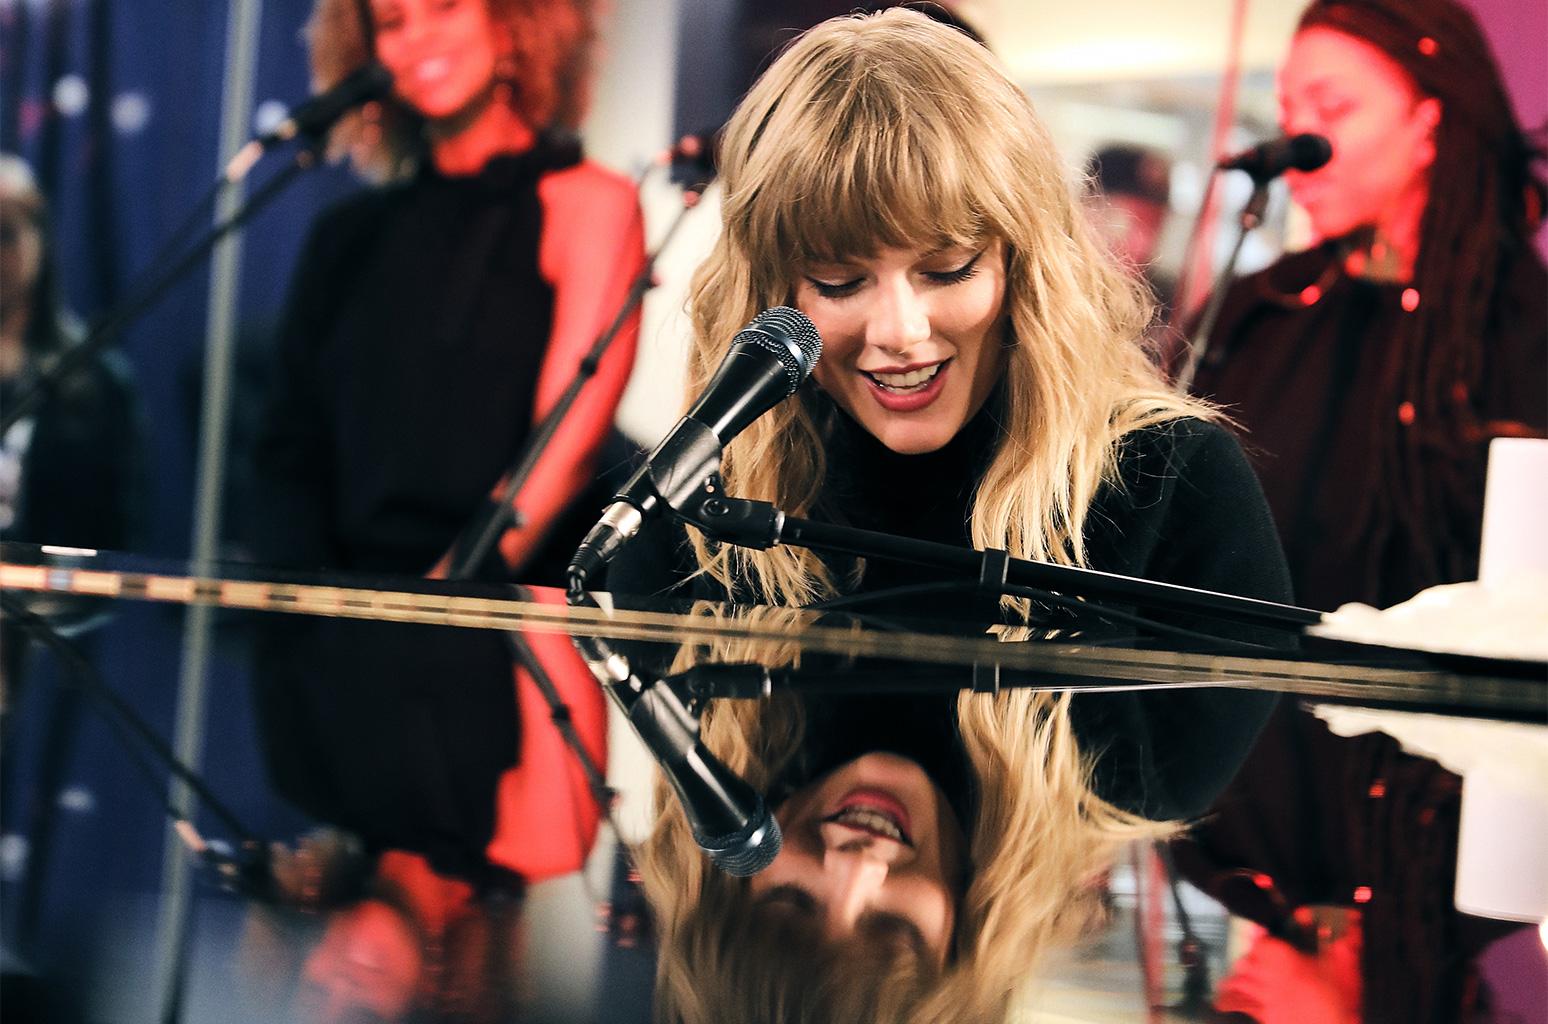 Lady Nerdy...Taylor Swift 泰勒絲歌詞中文翻譯: Taylor Swift - Delicate 中文翻譯歌詞